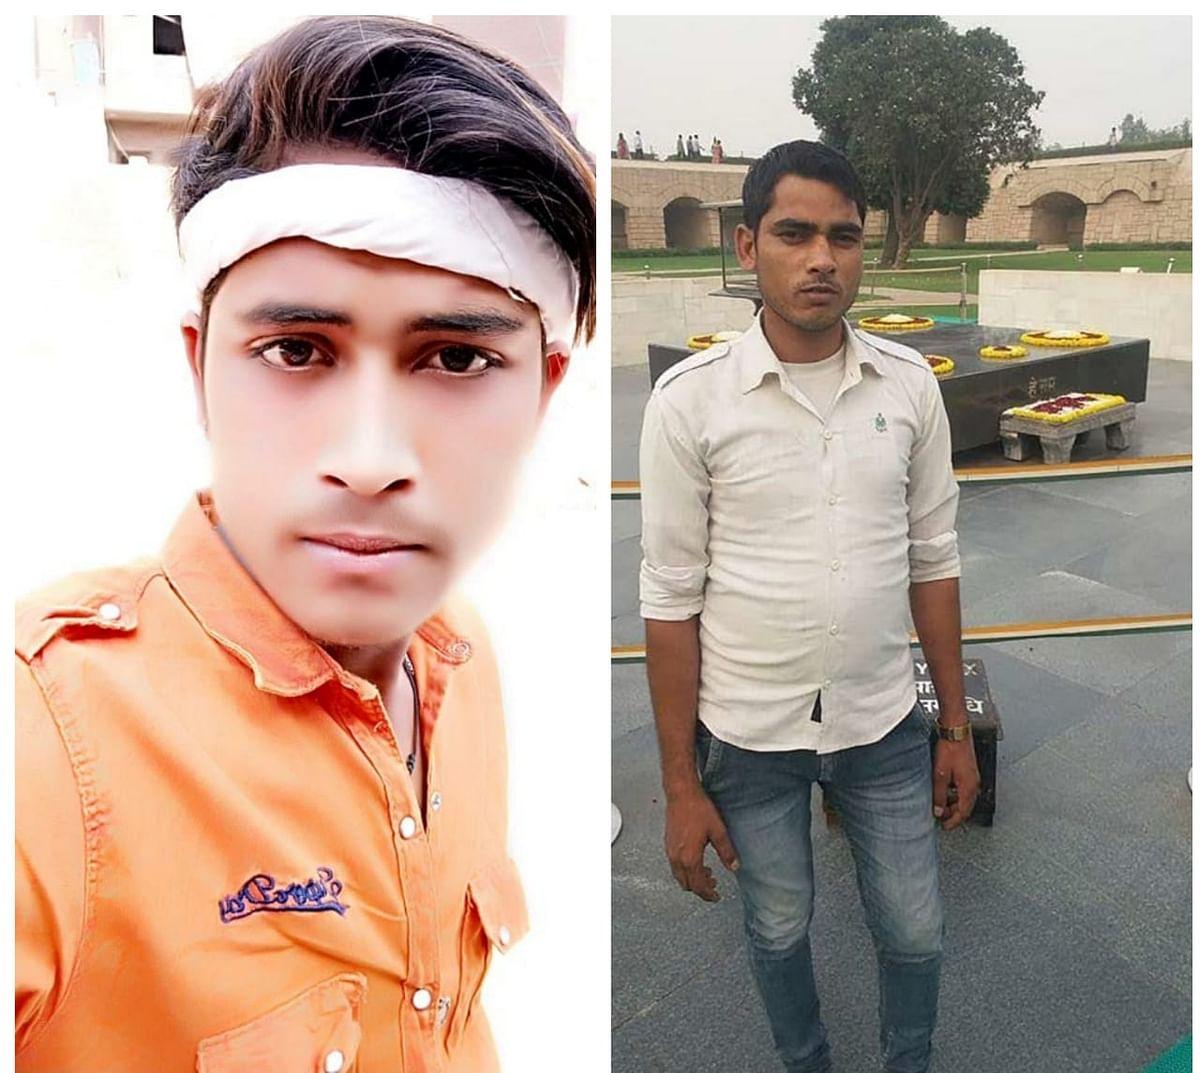 Hashim, 19, and Amir, 30, were murdered on February 26.